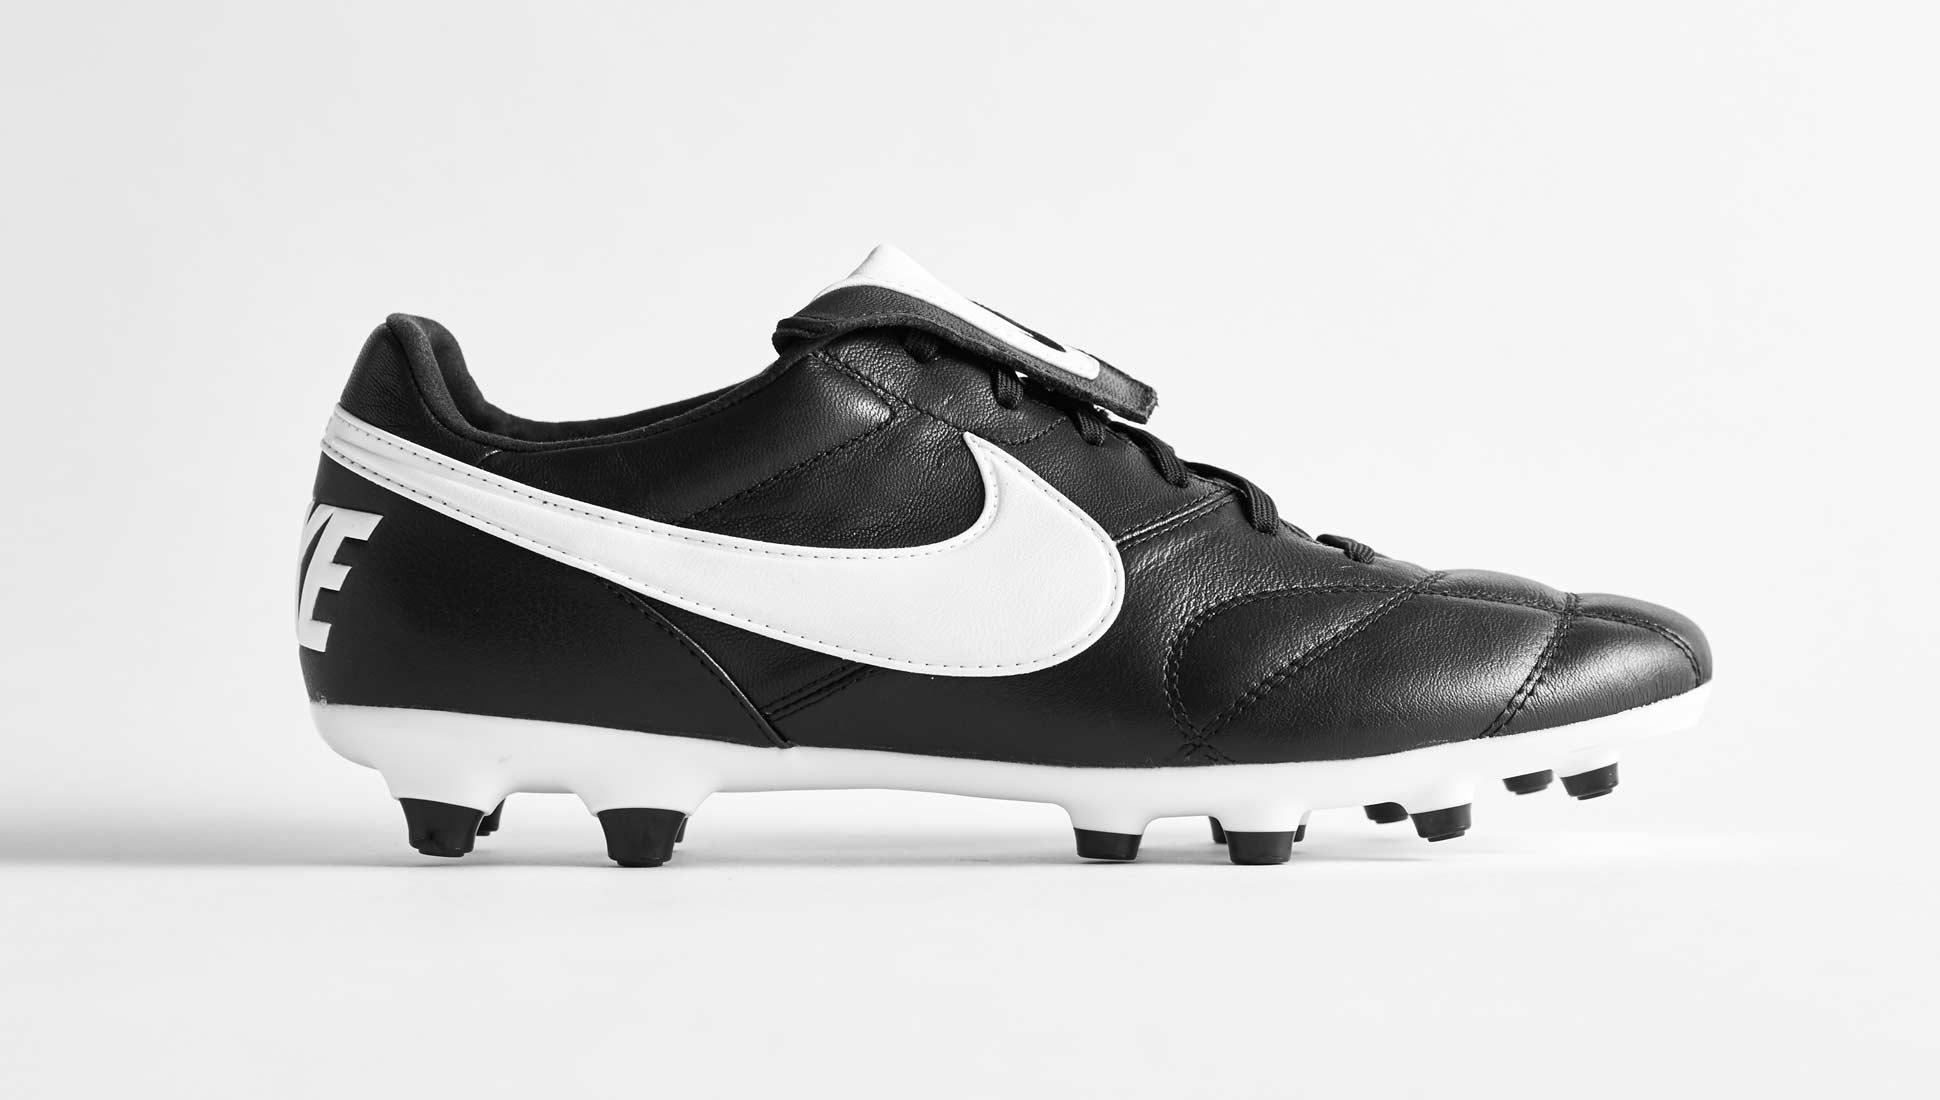 8f6a12d72 Nike Launch The Premier 2.0 - SoccerBible.